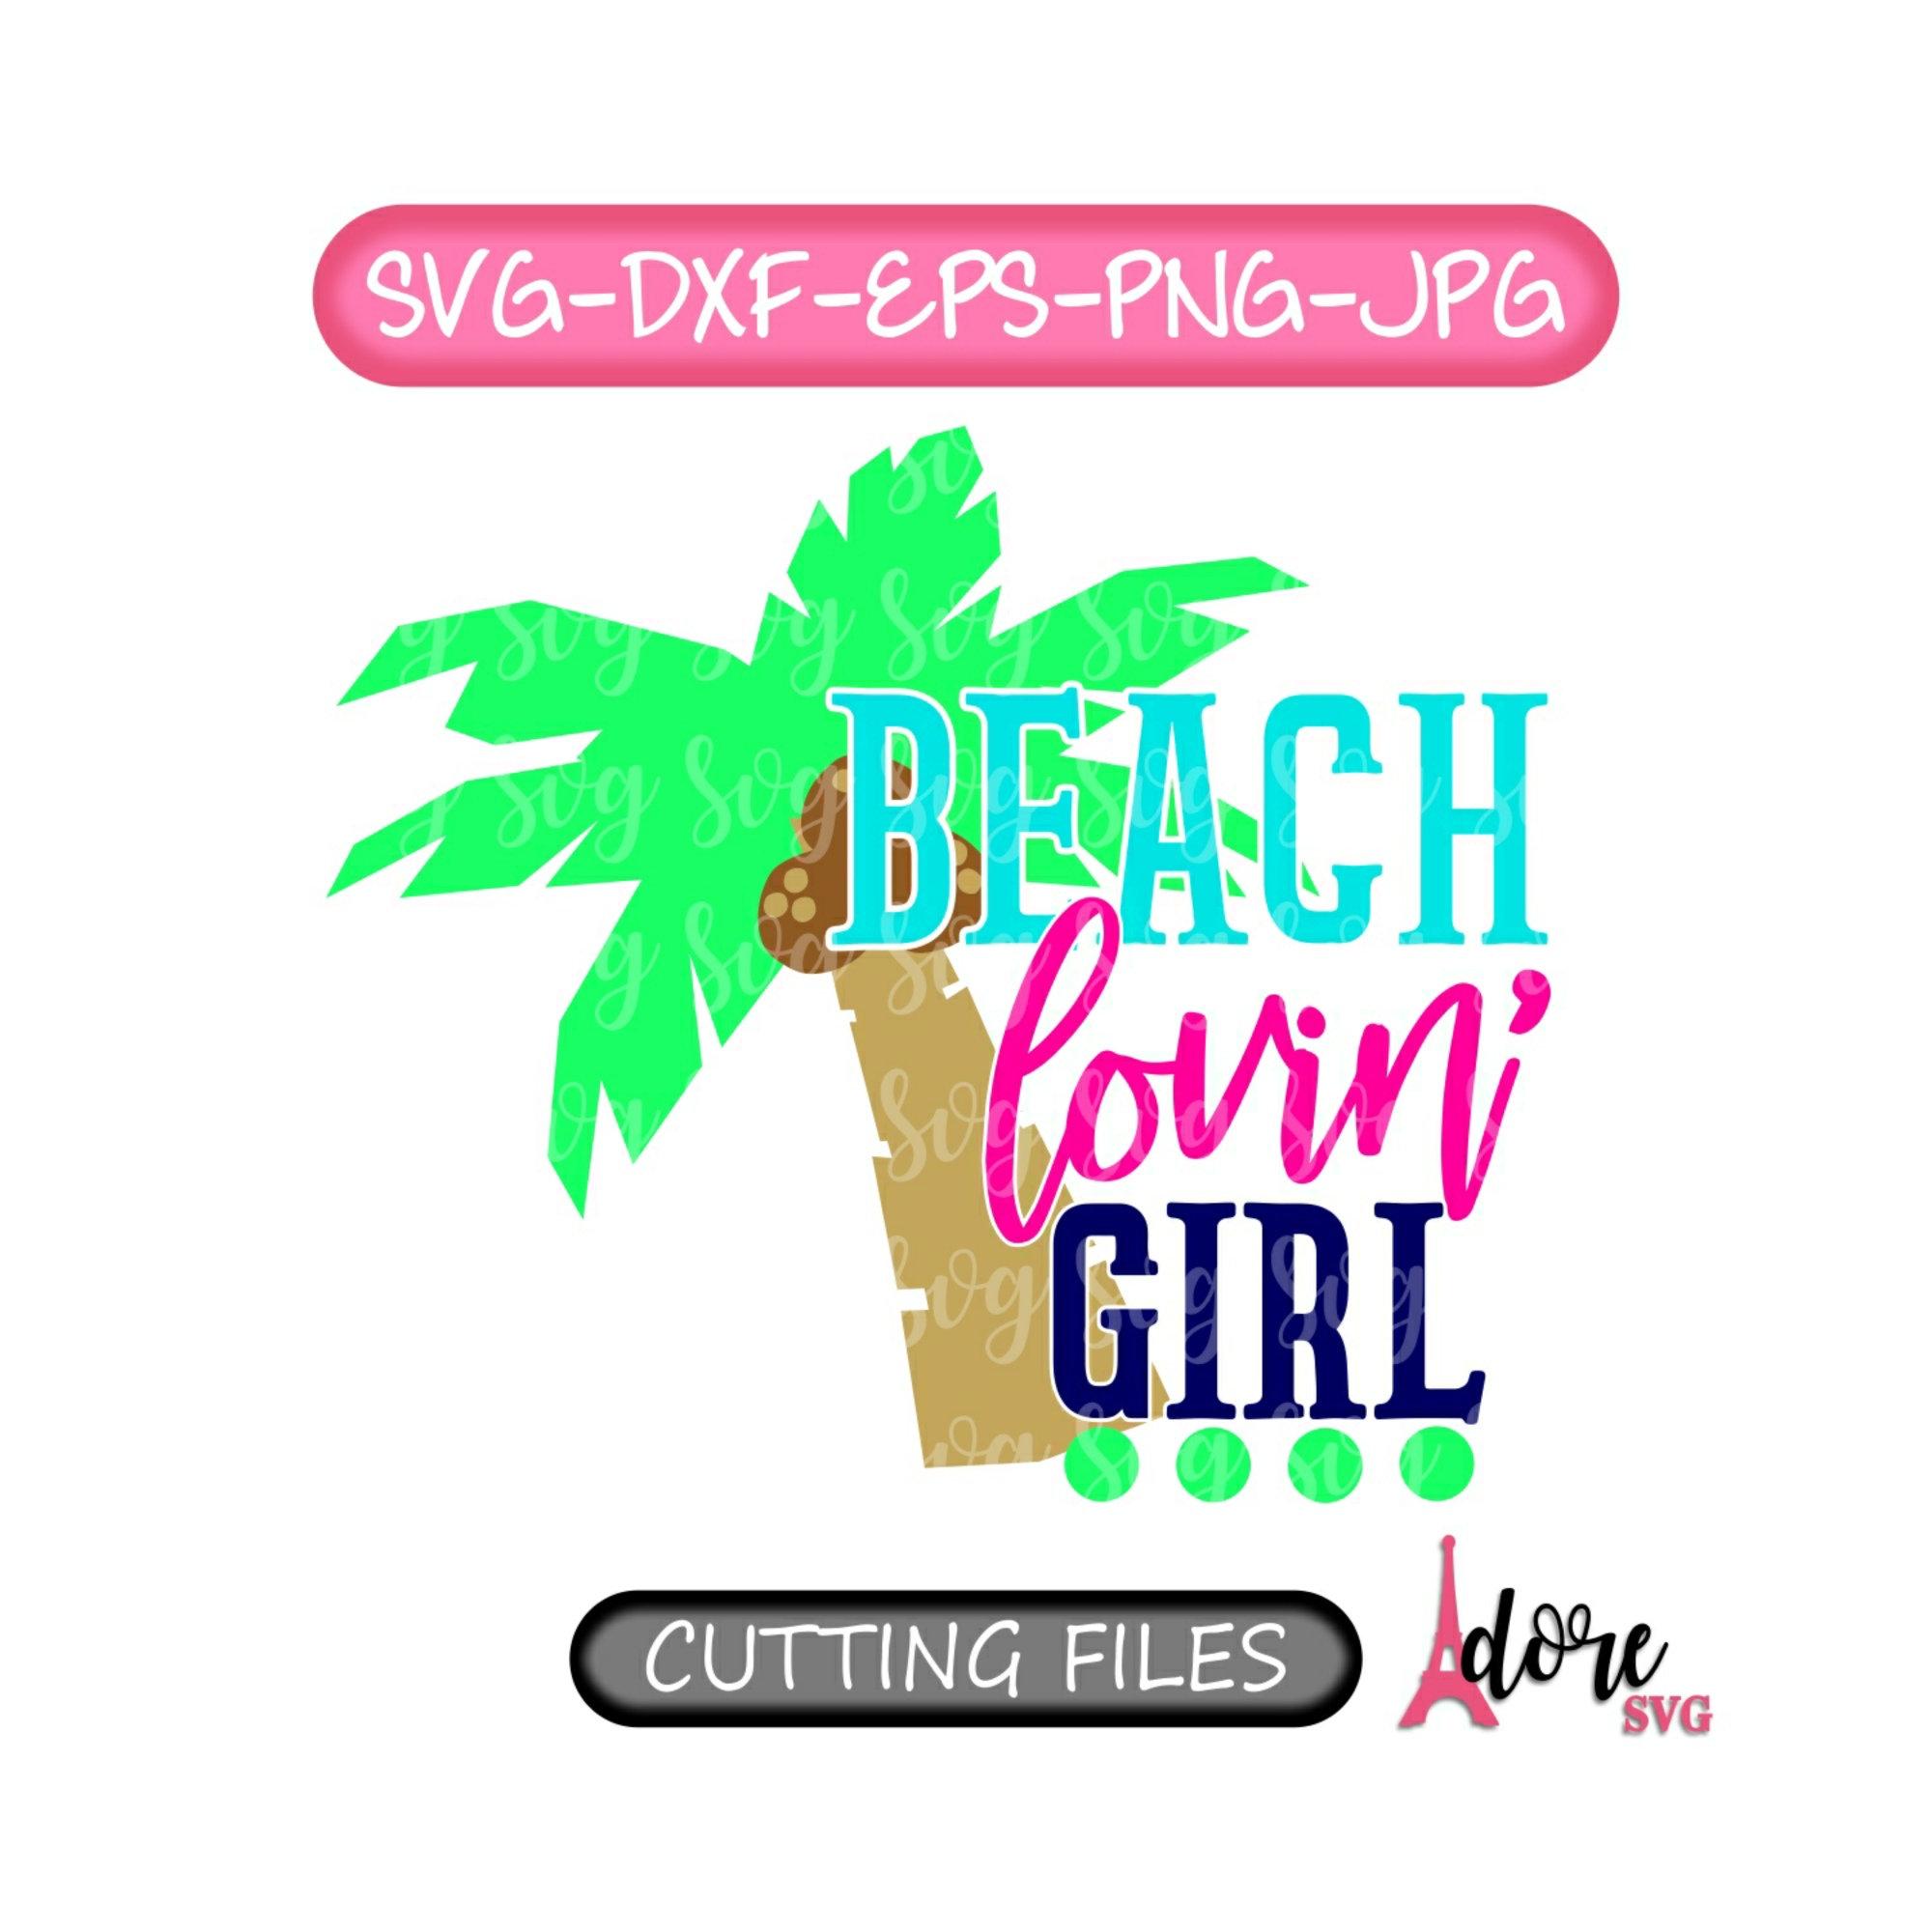 Beach-lovin-girl-svgvacation-svgbeach-svgbeachin-svgcruise-svgvacay-svgsummer-svgsummer-vacation-svgbeach-tshirt-svgpalm-tree-svg-5e223cec